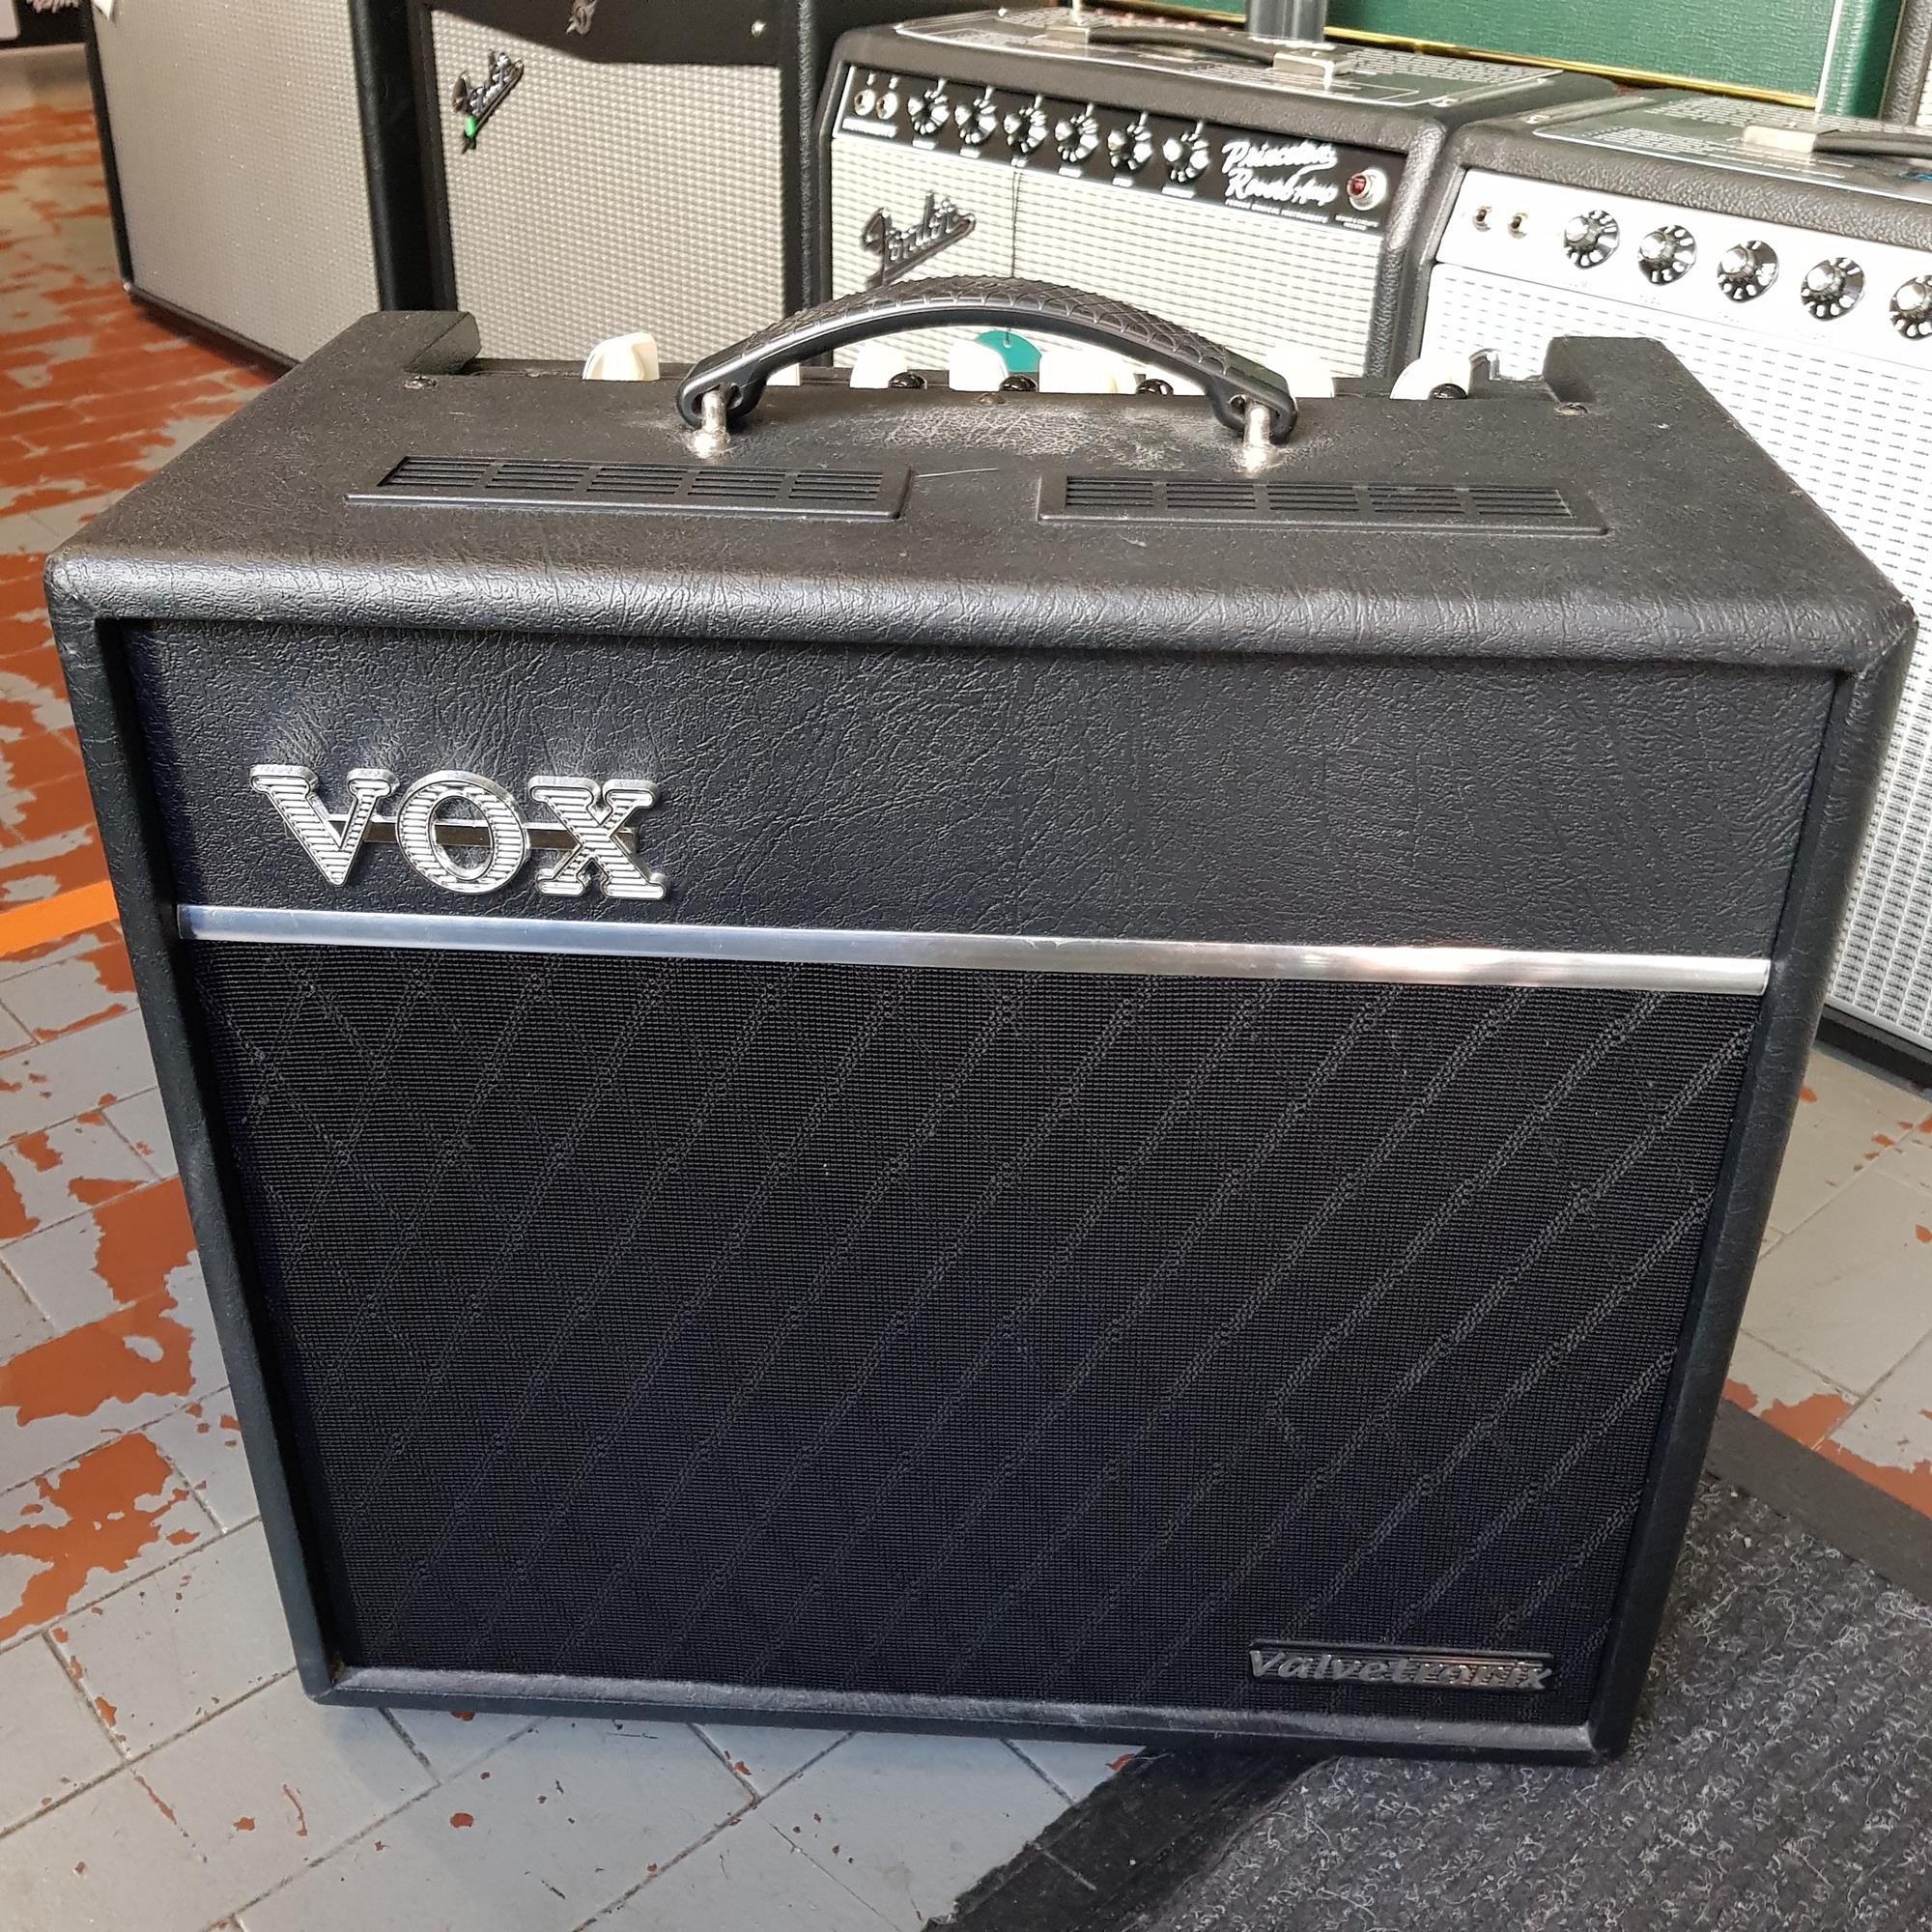 VOX-VT80-VALVETRONIX-VFS-5-sku-1593874066782